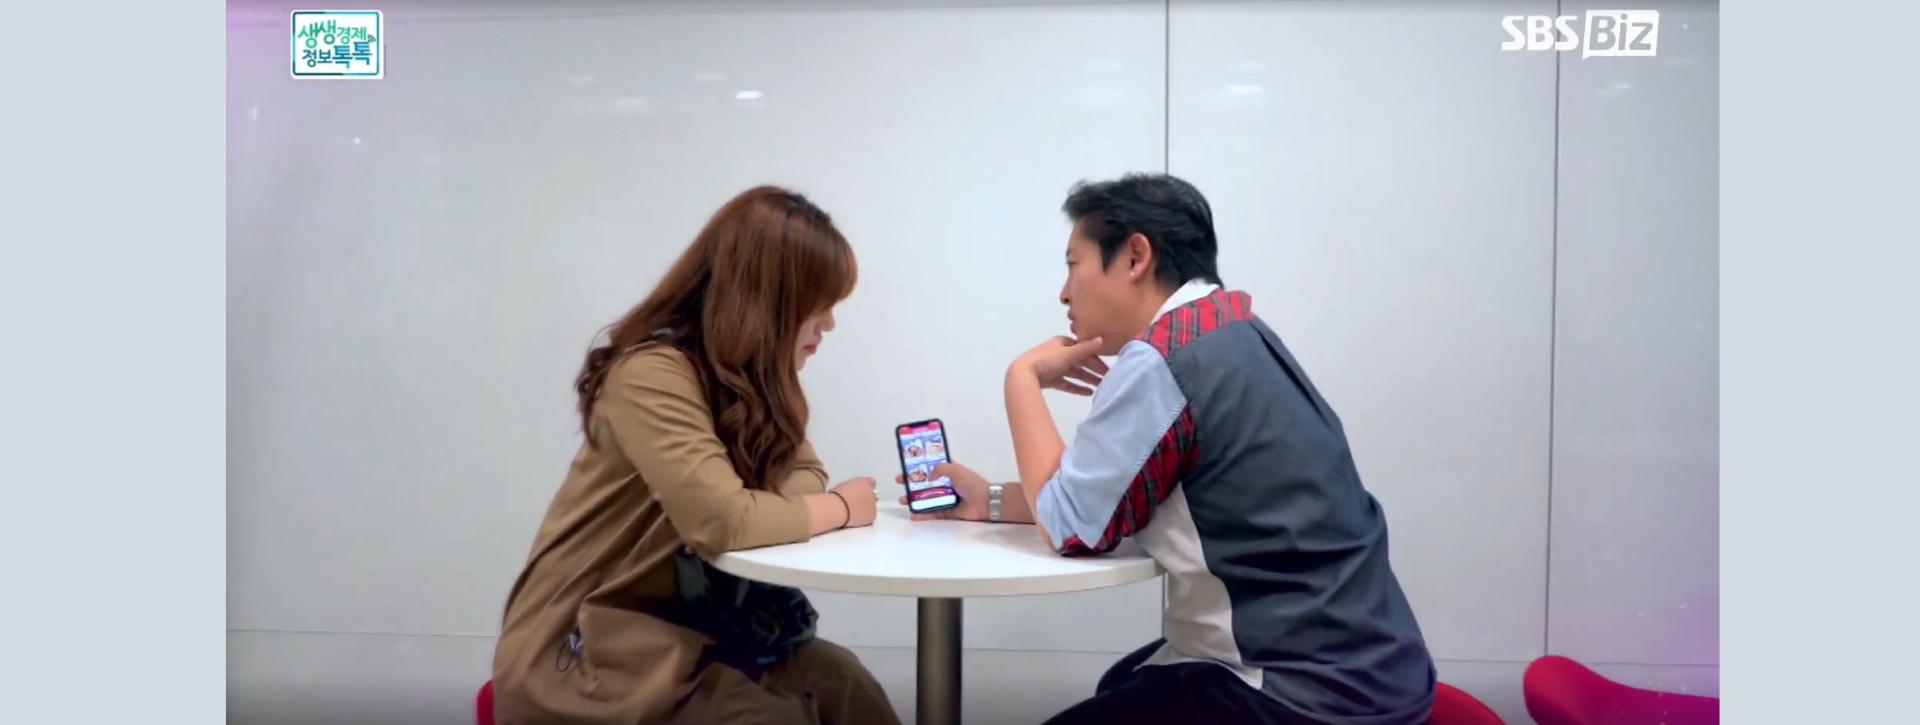 iClick's First Appearance on Korean National TV – SBS Biz